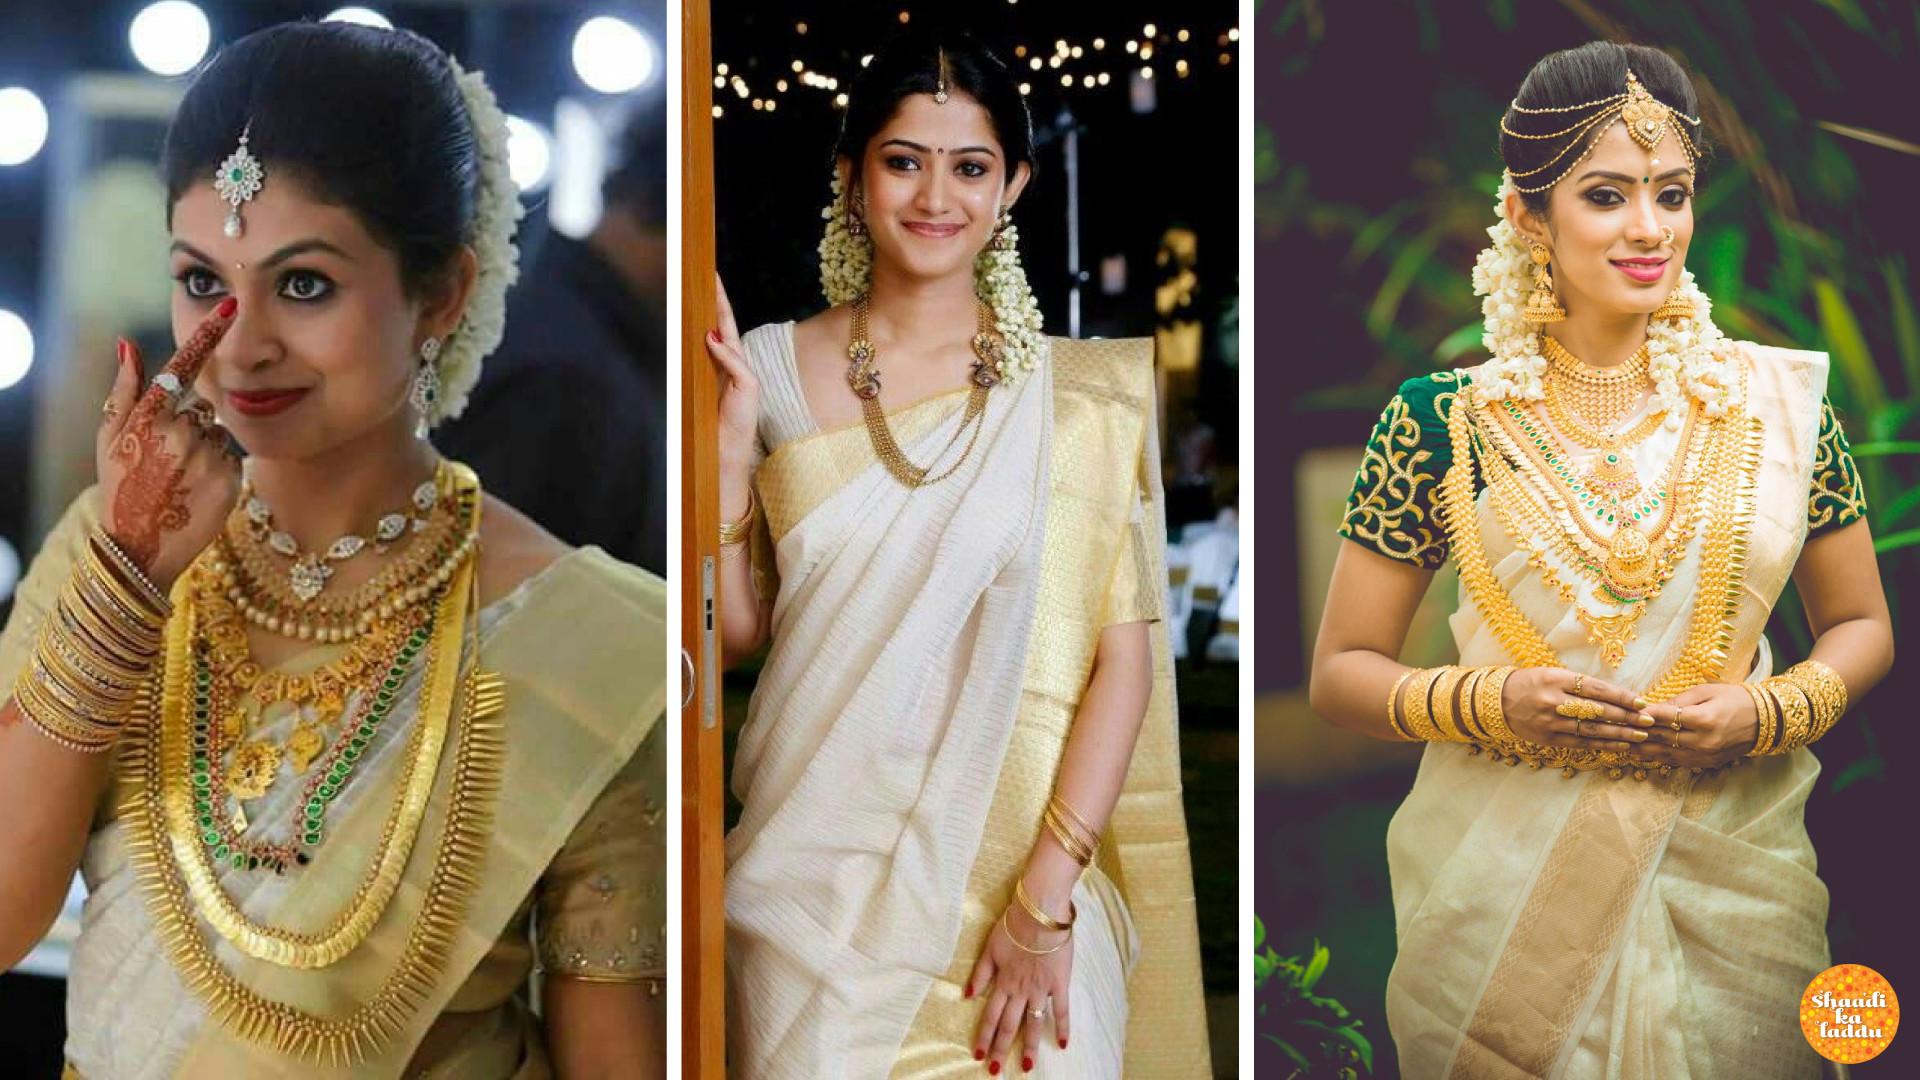 Malyali Bride